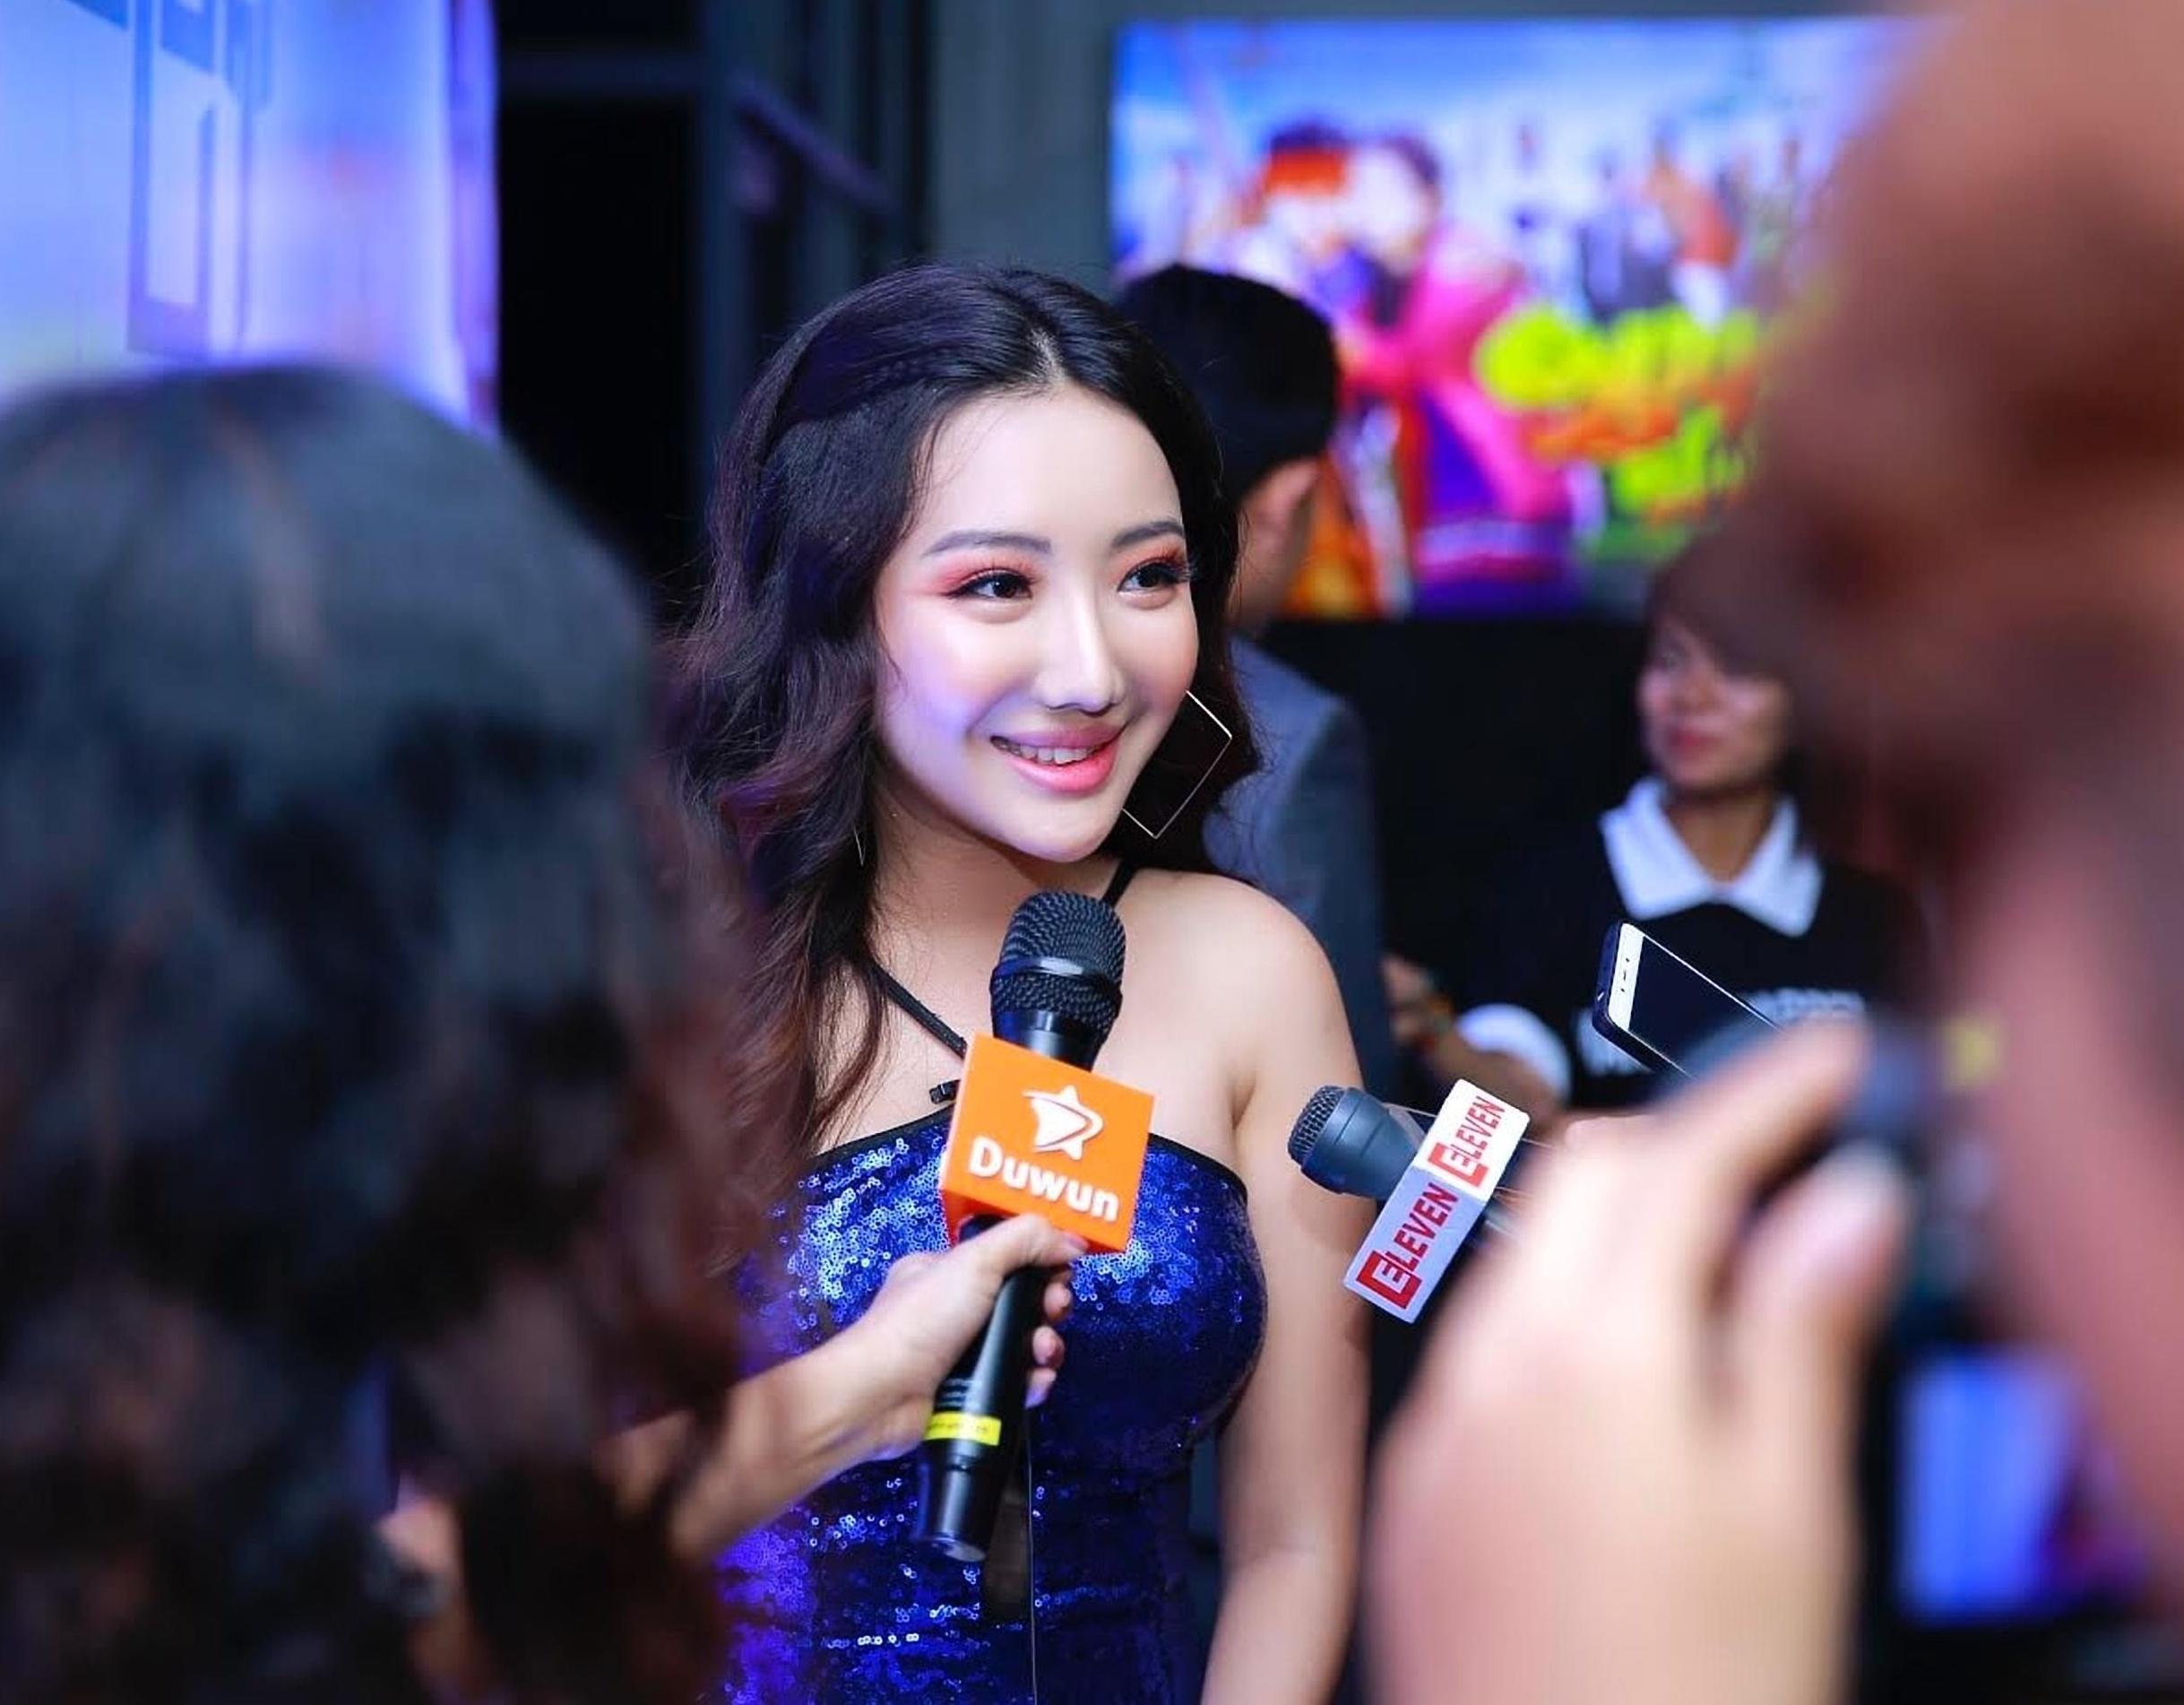 Hsu Eaint San - Wikipedia